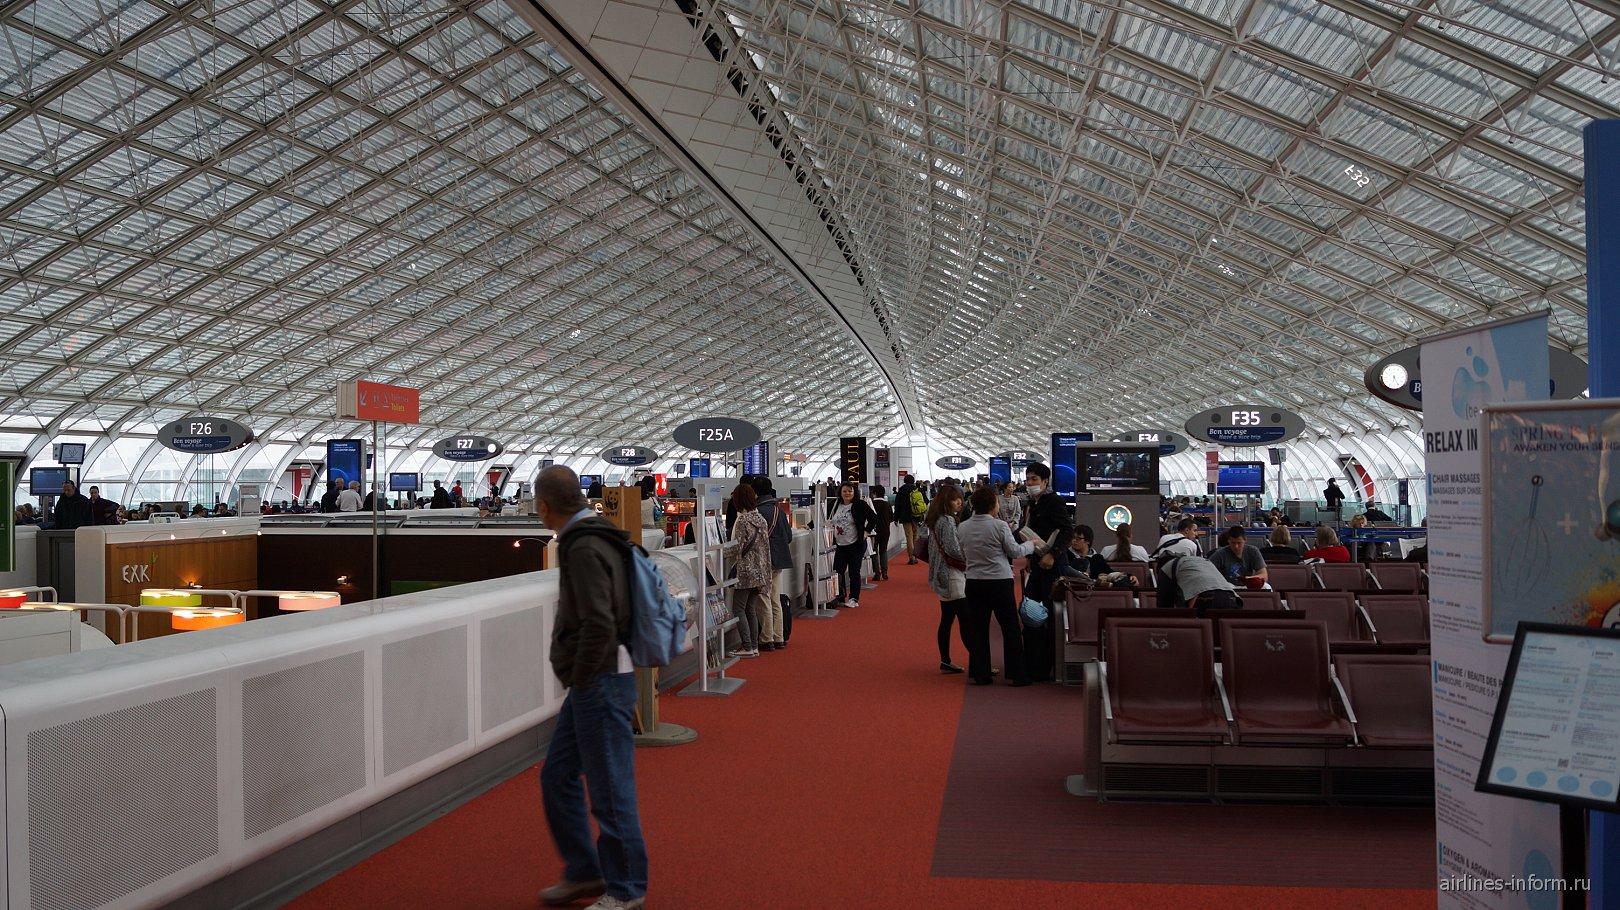 Зал ожидания в терминале 2F аэропорта Париж Шарль-Де-Голль